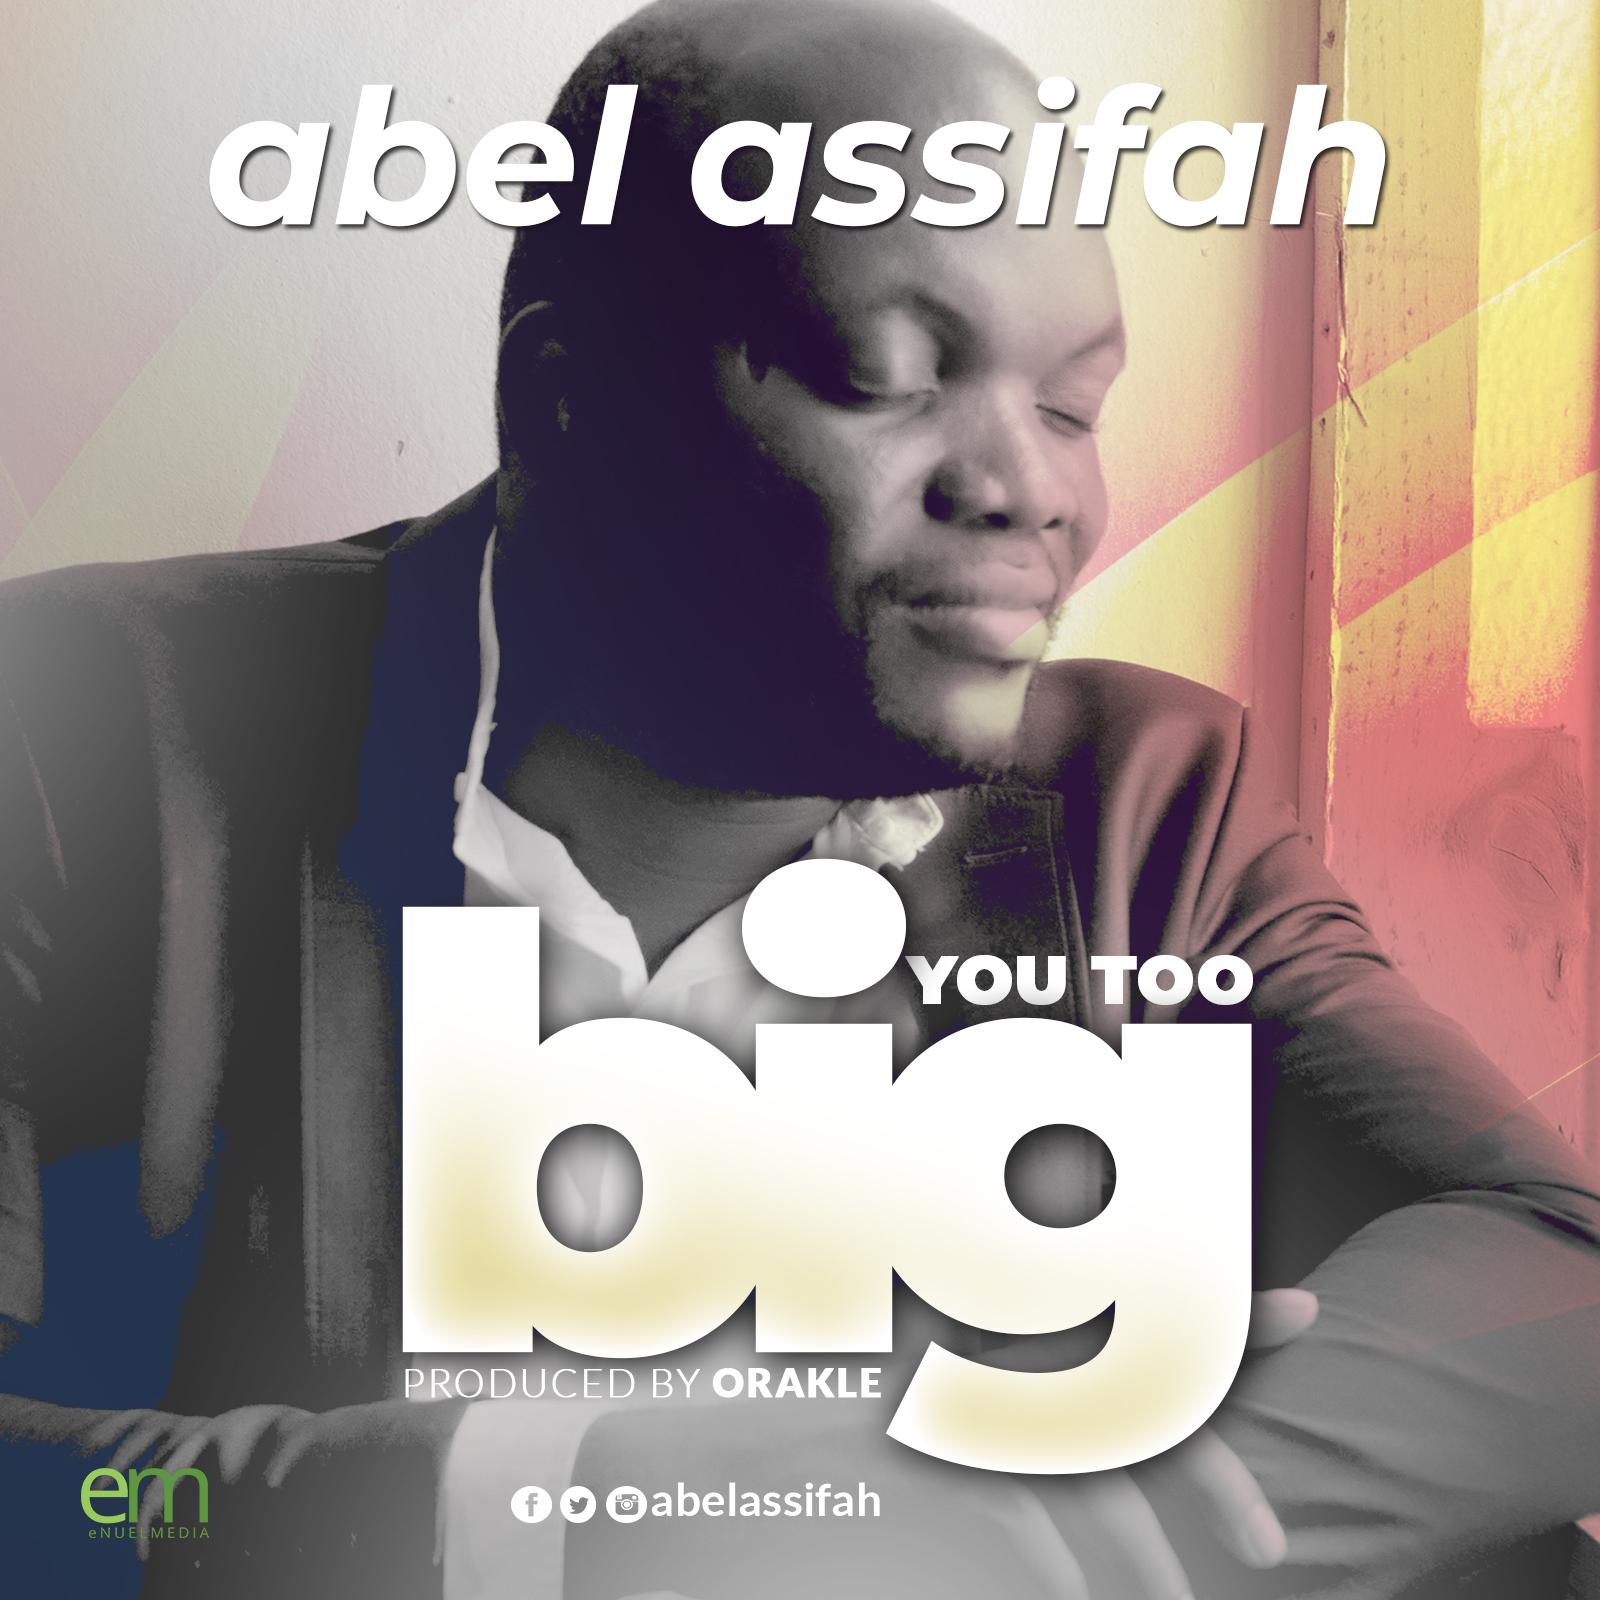 You are too Big - Abel Assifah   @abelassifah